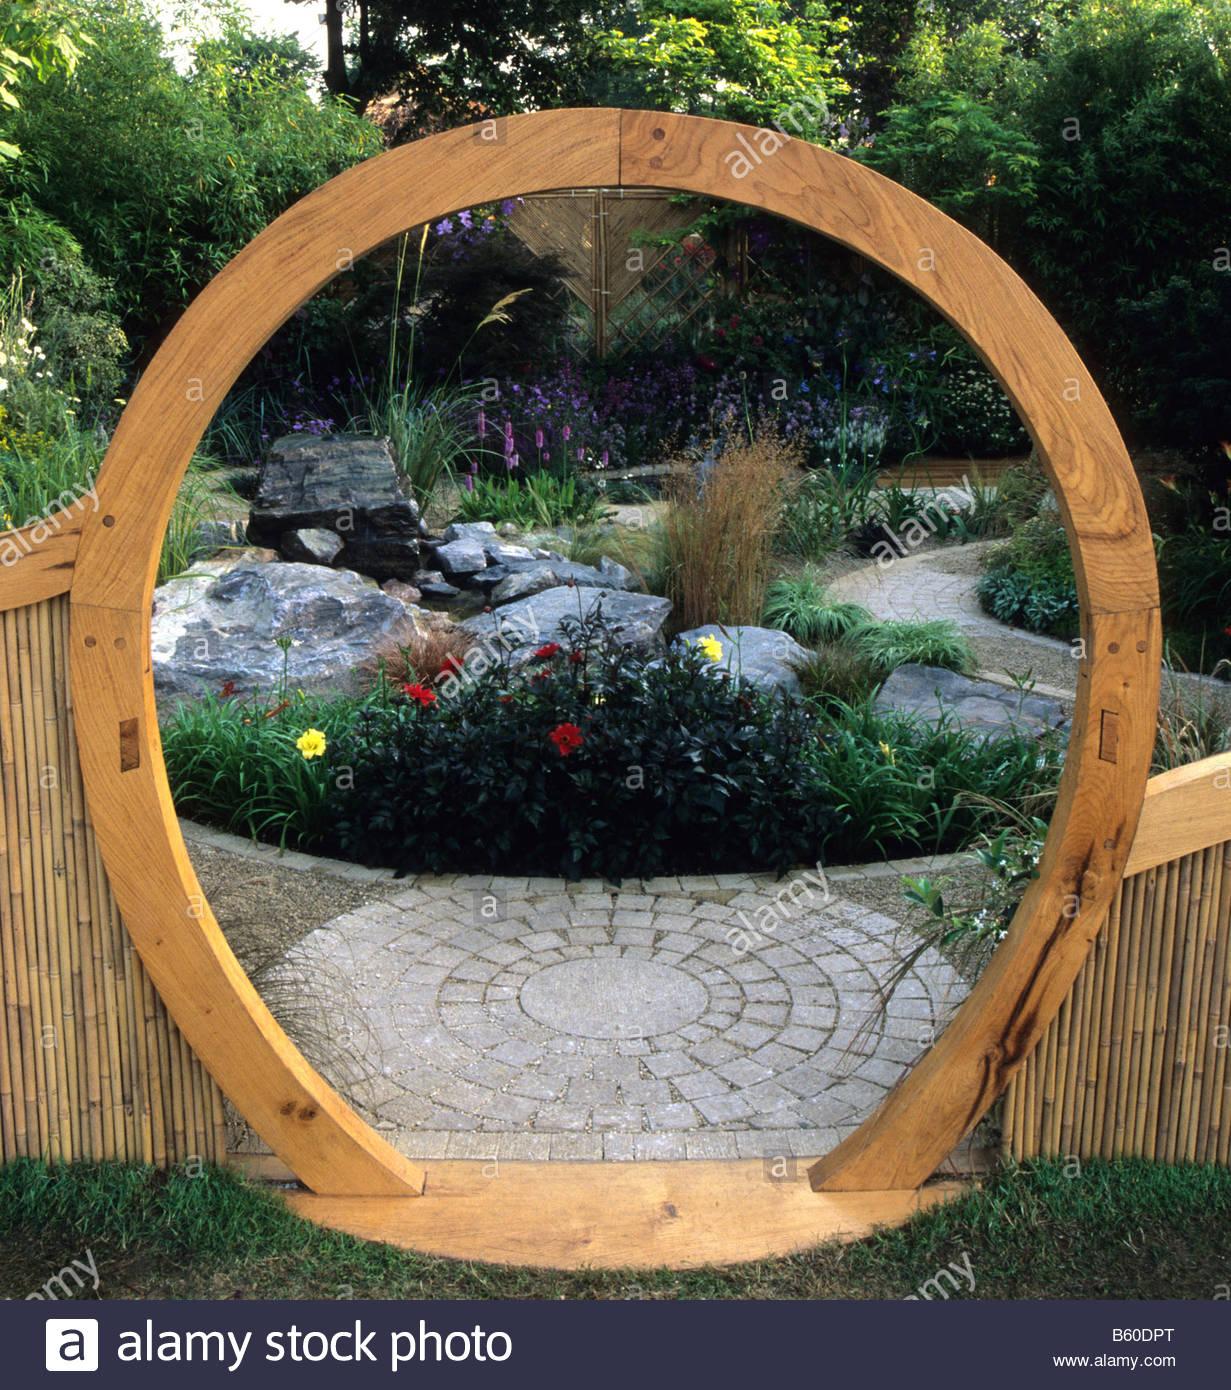 Garden Stock Image Image Of Design: Feng Shui Garden London Design Pamela Woods Circular Moon